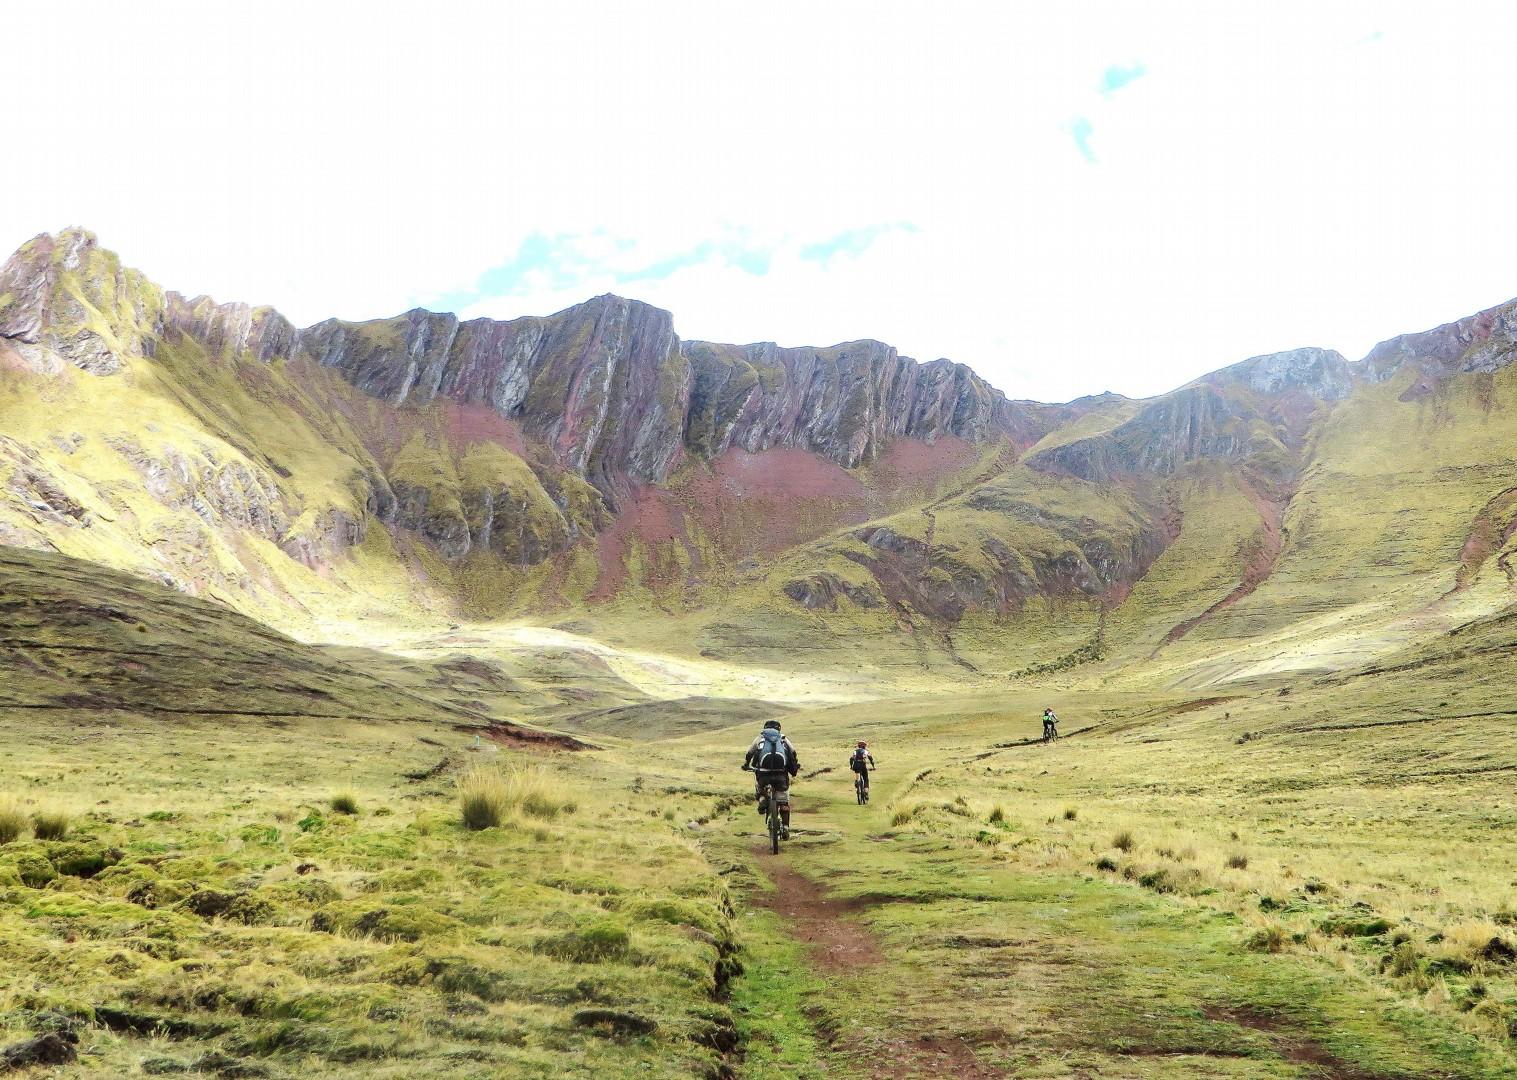 guided-mountain-bike-holiday-in-peru.jpg - Peru - Andean Journey - Guided Mountain Bike Holiday - Mountain Biking